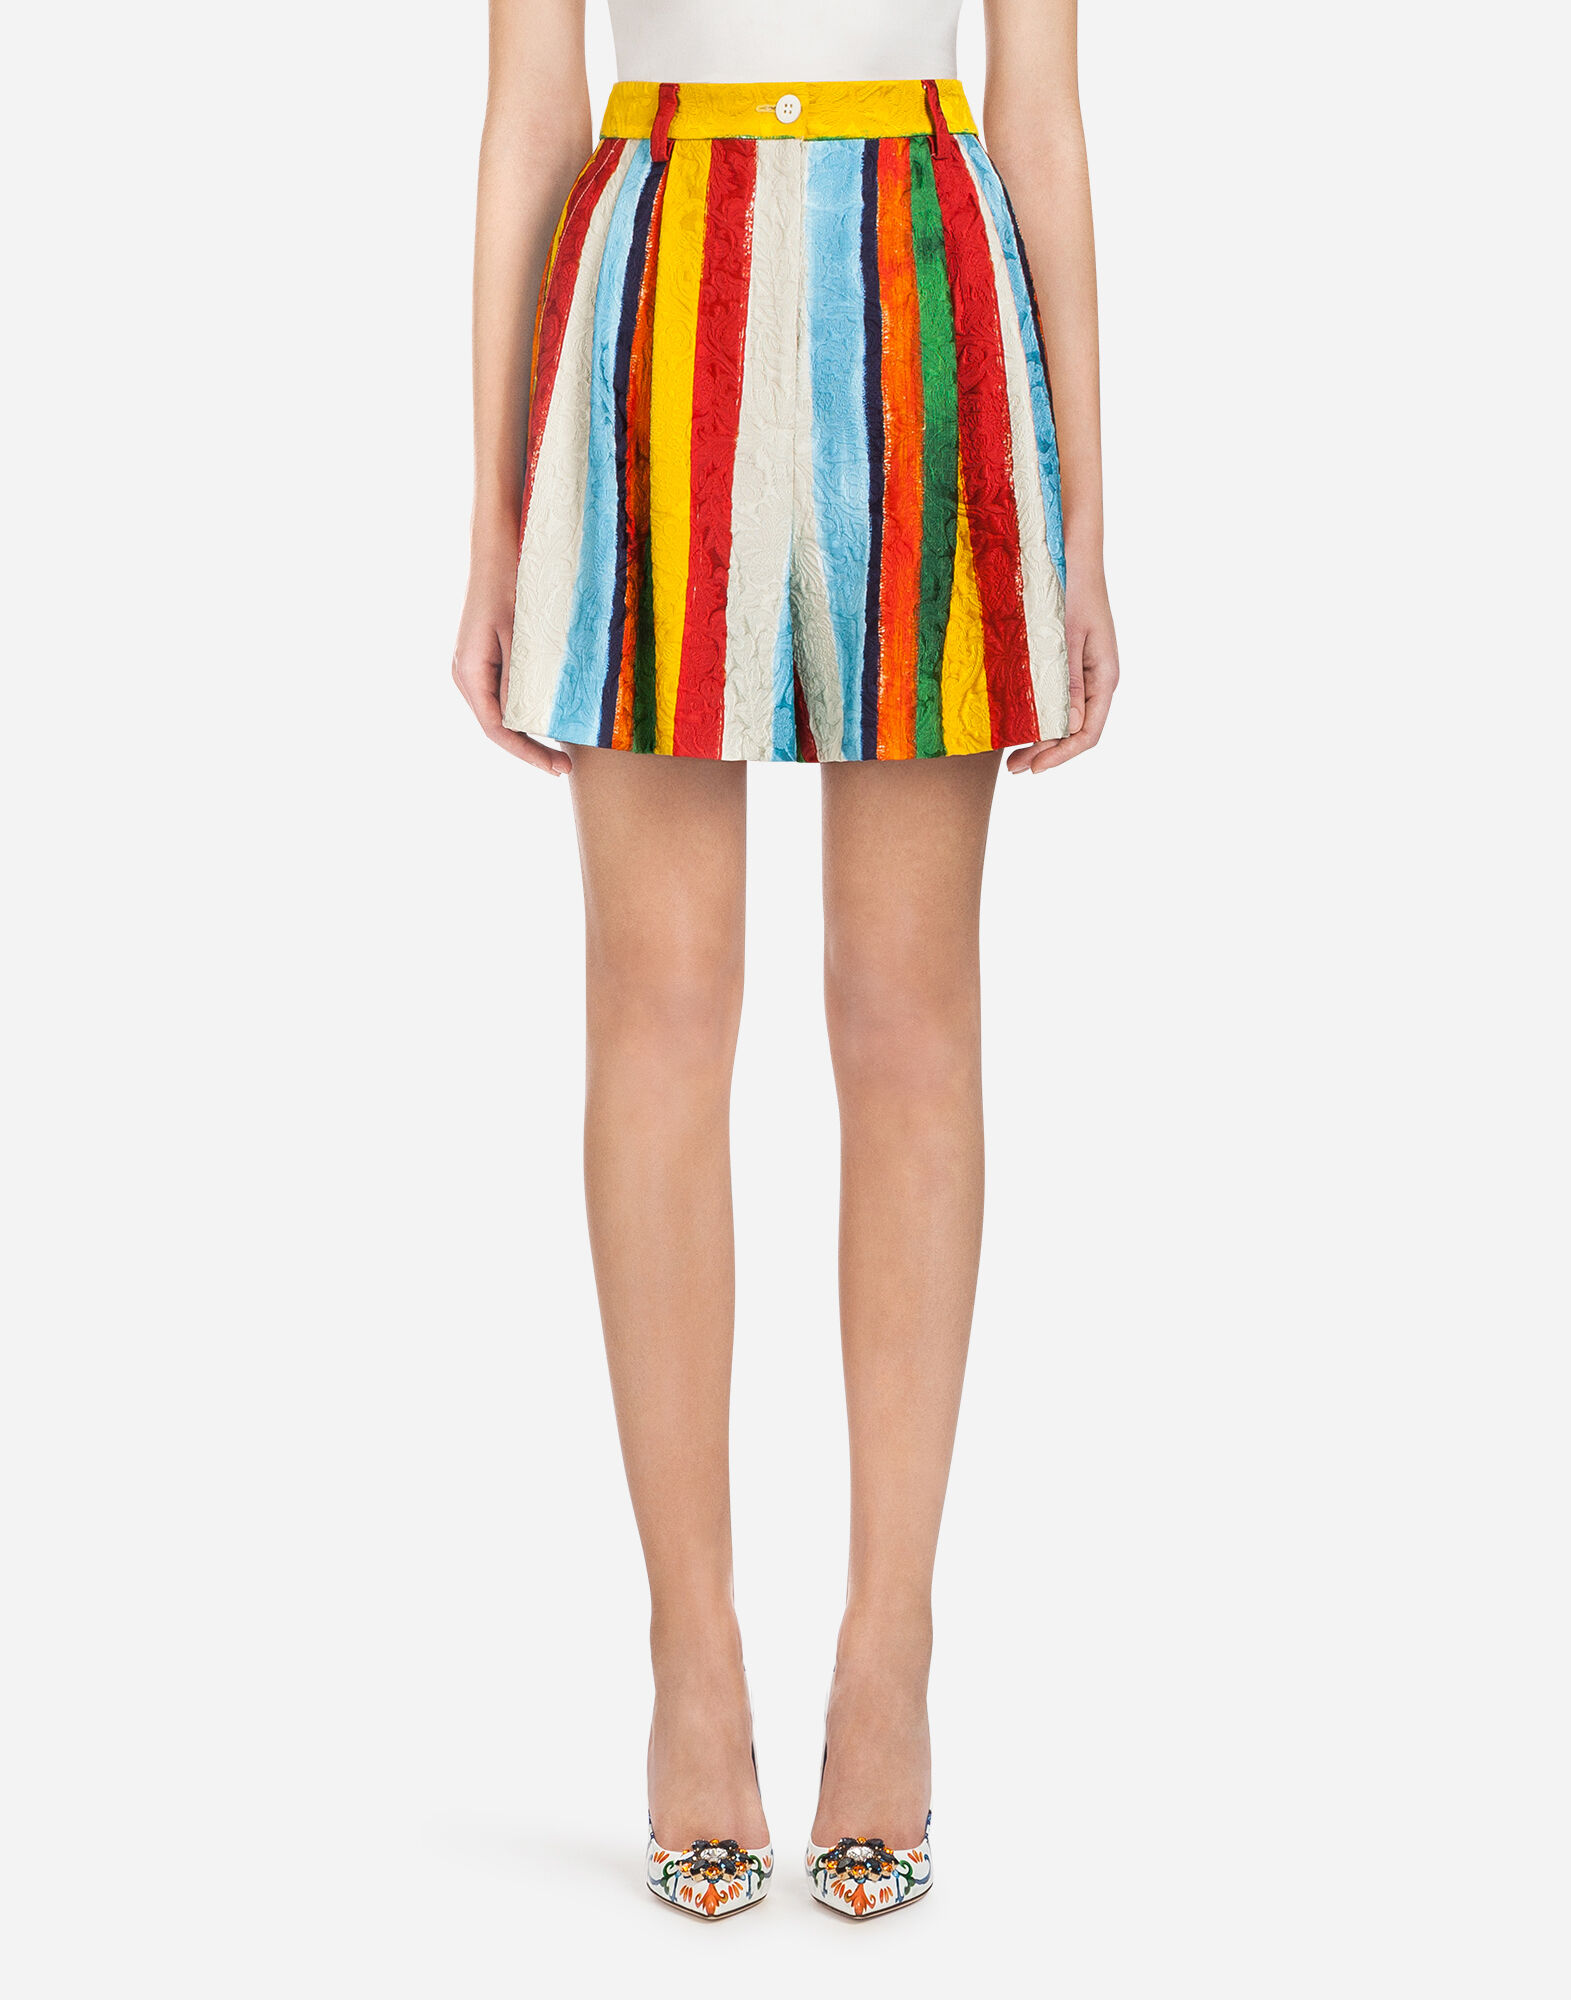 Vestir Mujer amp;gabbana Pantalones Prendas Dolce Brocado EnHwUxvq8